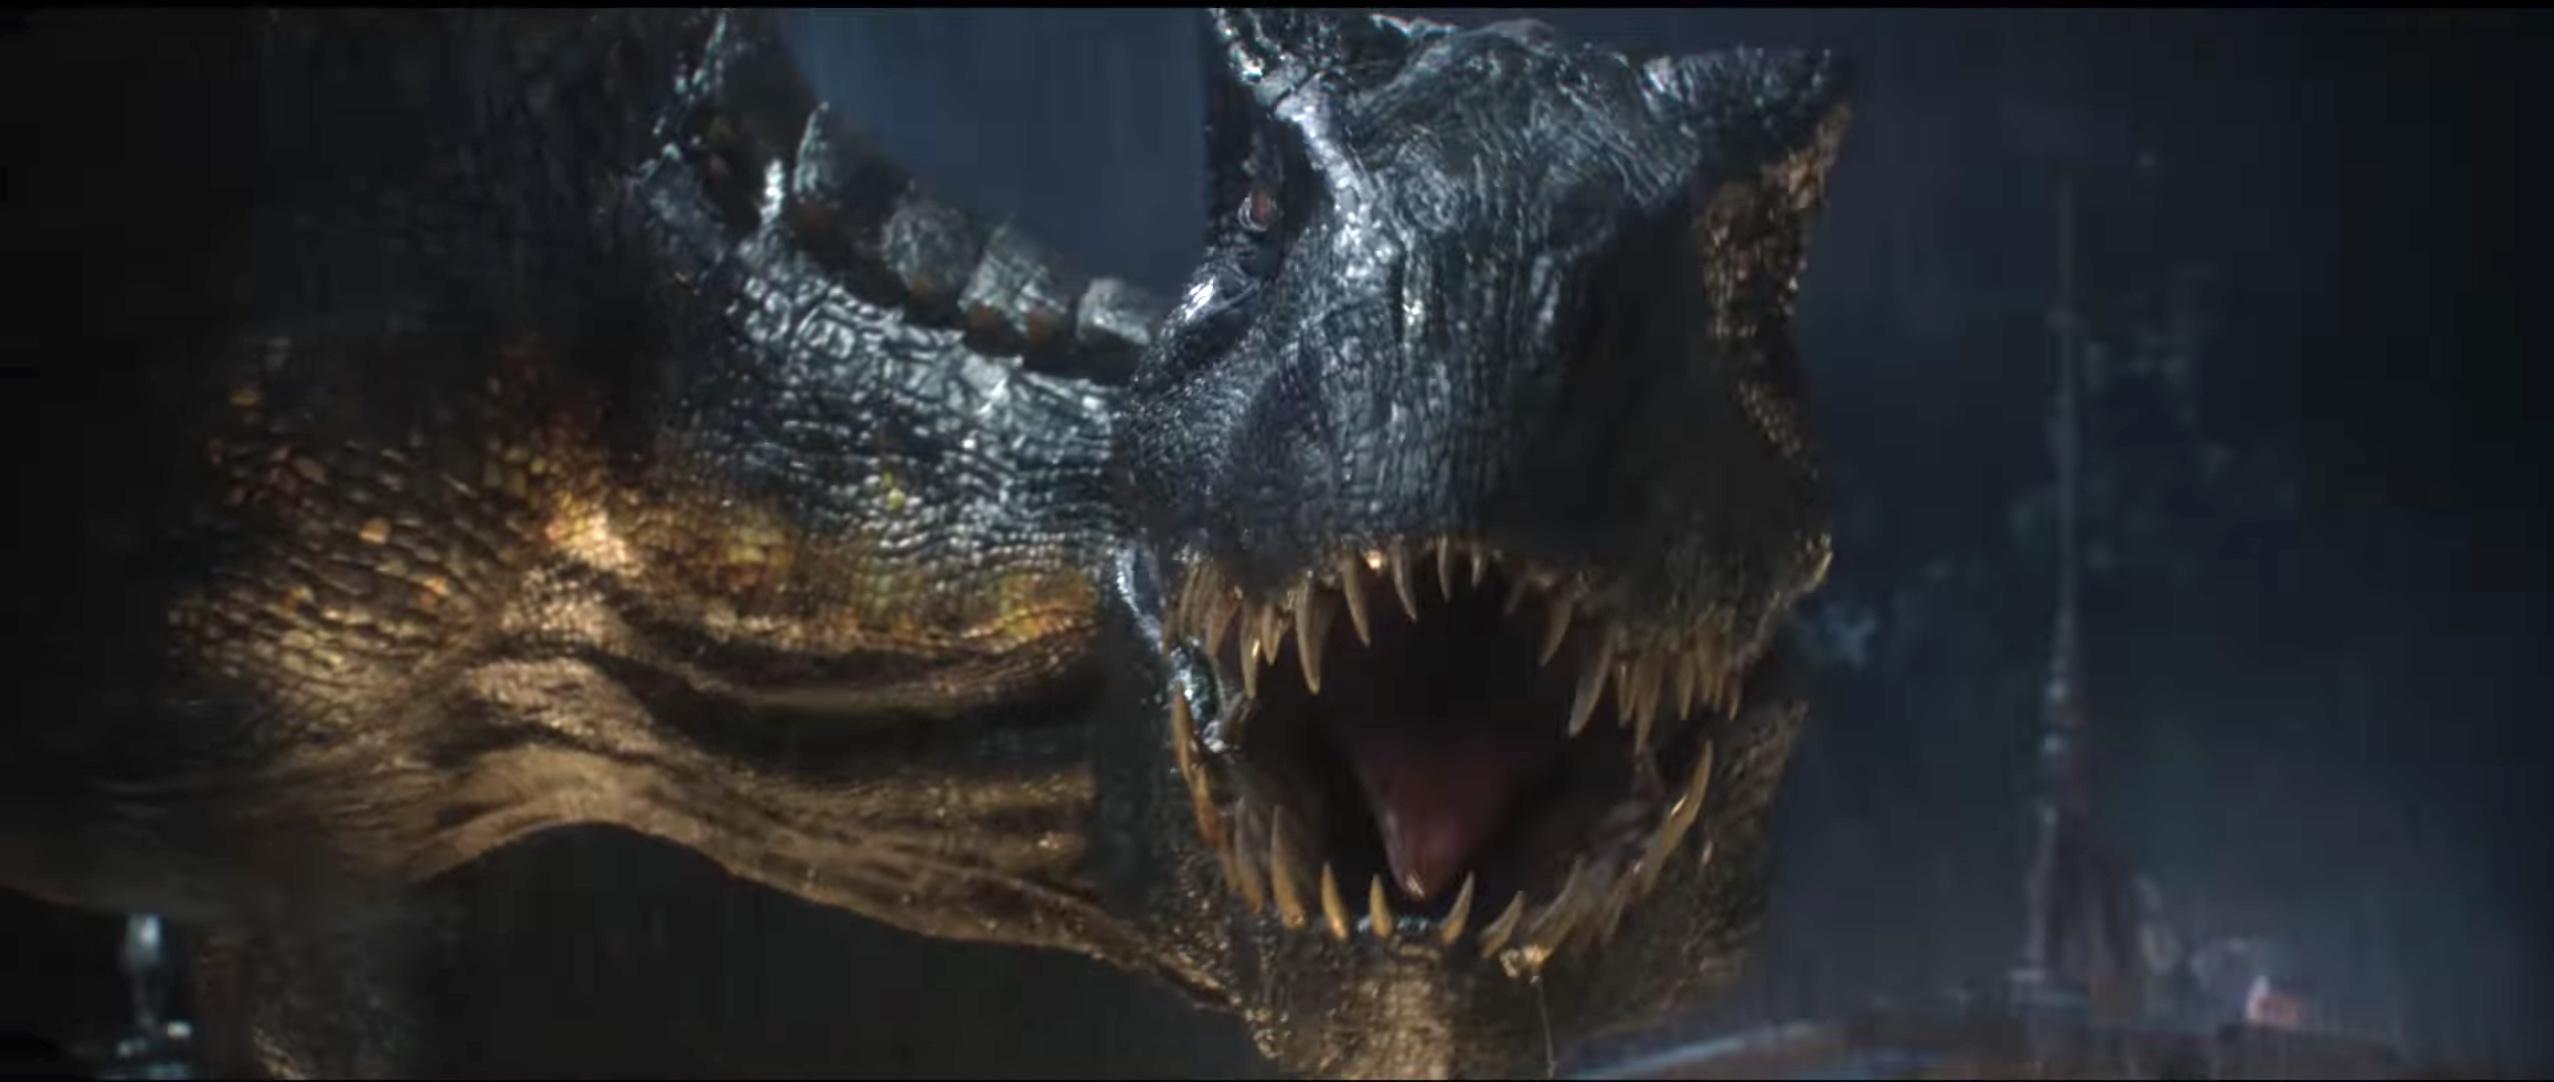 """Welcome to Jurassic World"": Watch the Final Jurassic World: Fallen Kingdom Trailer"